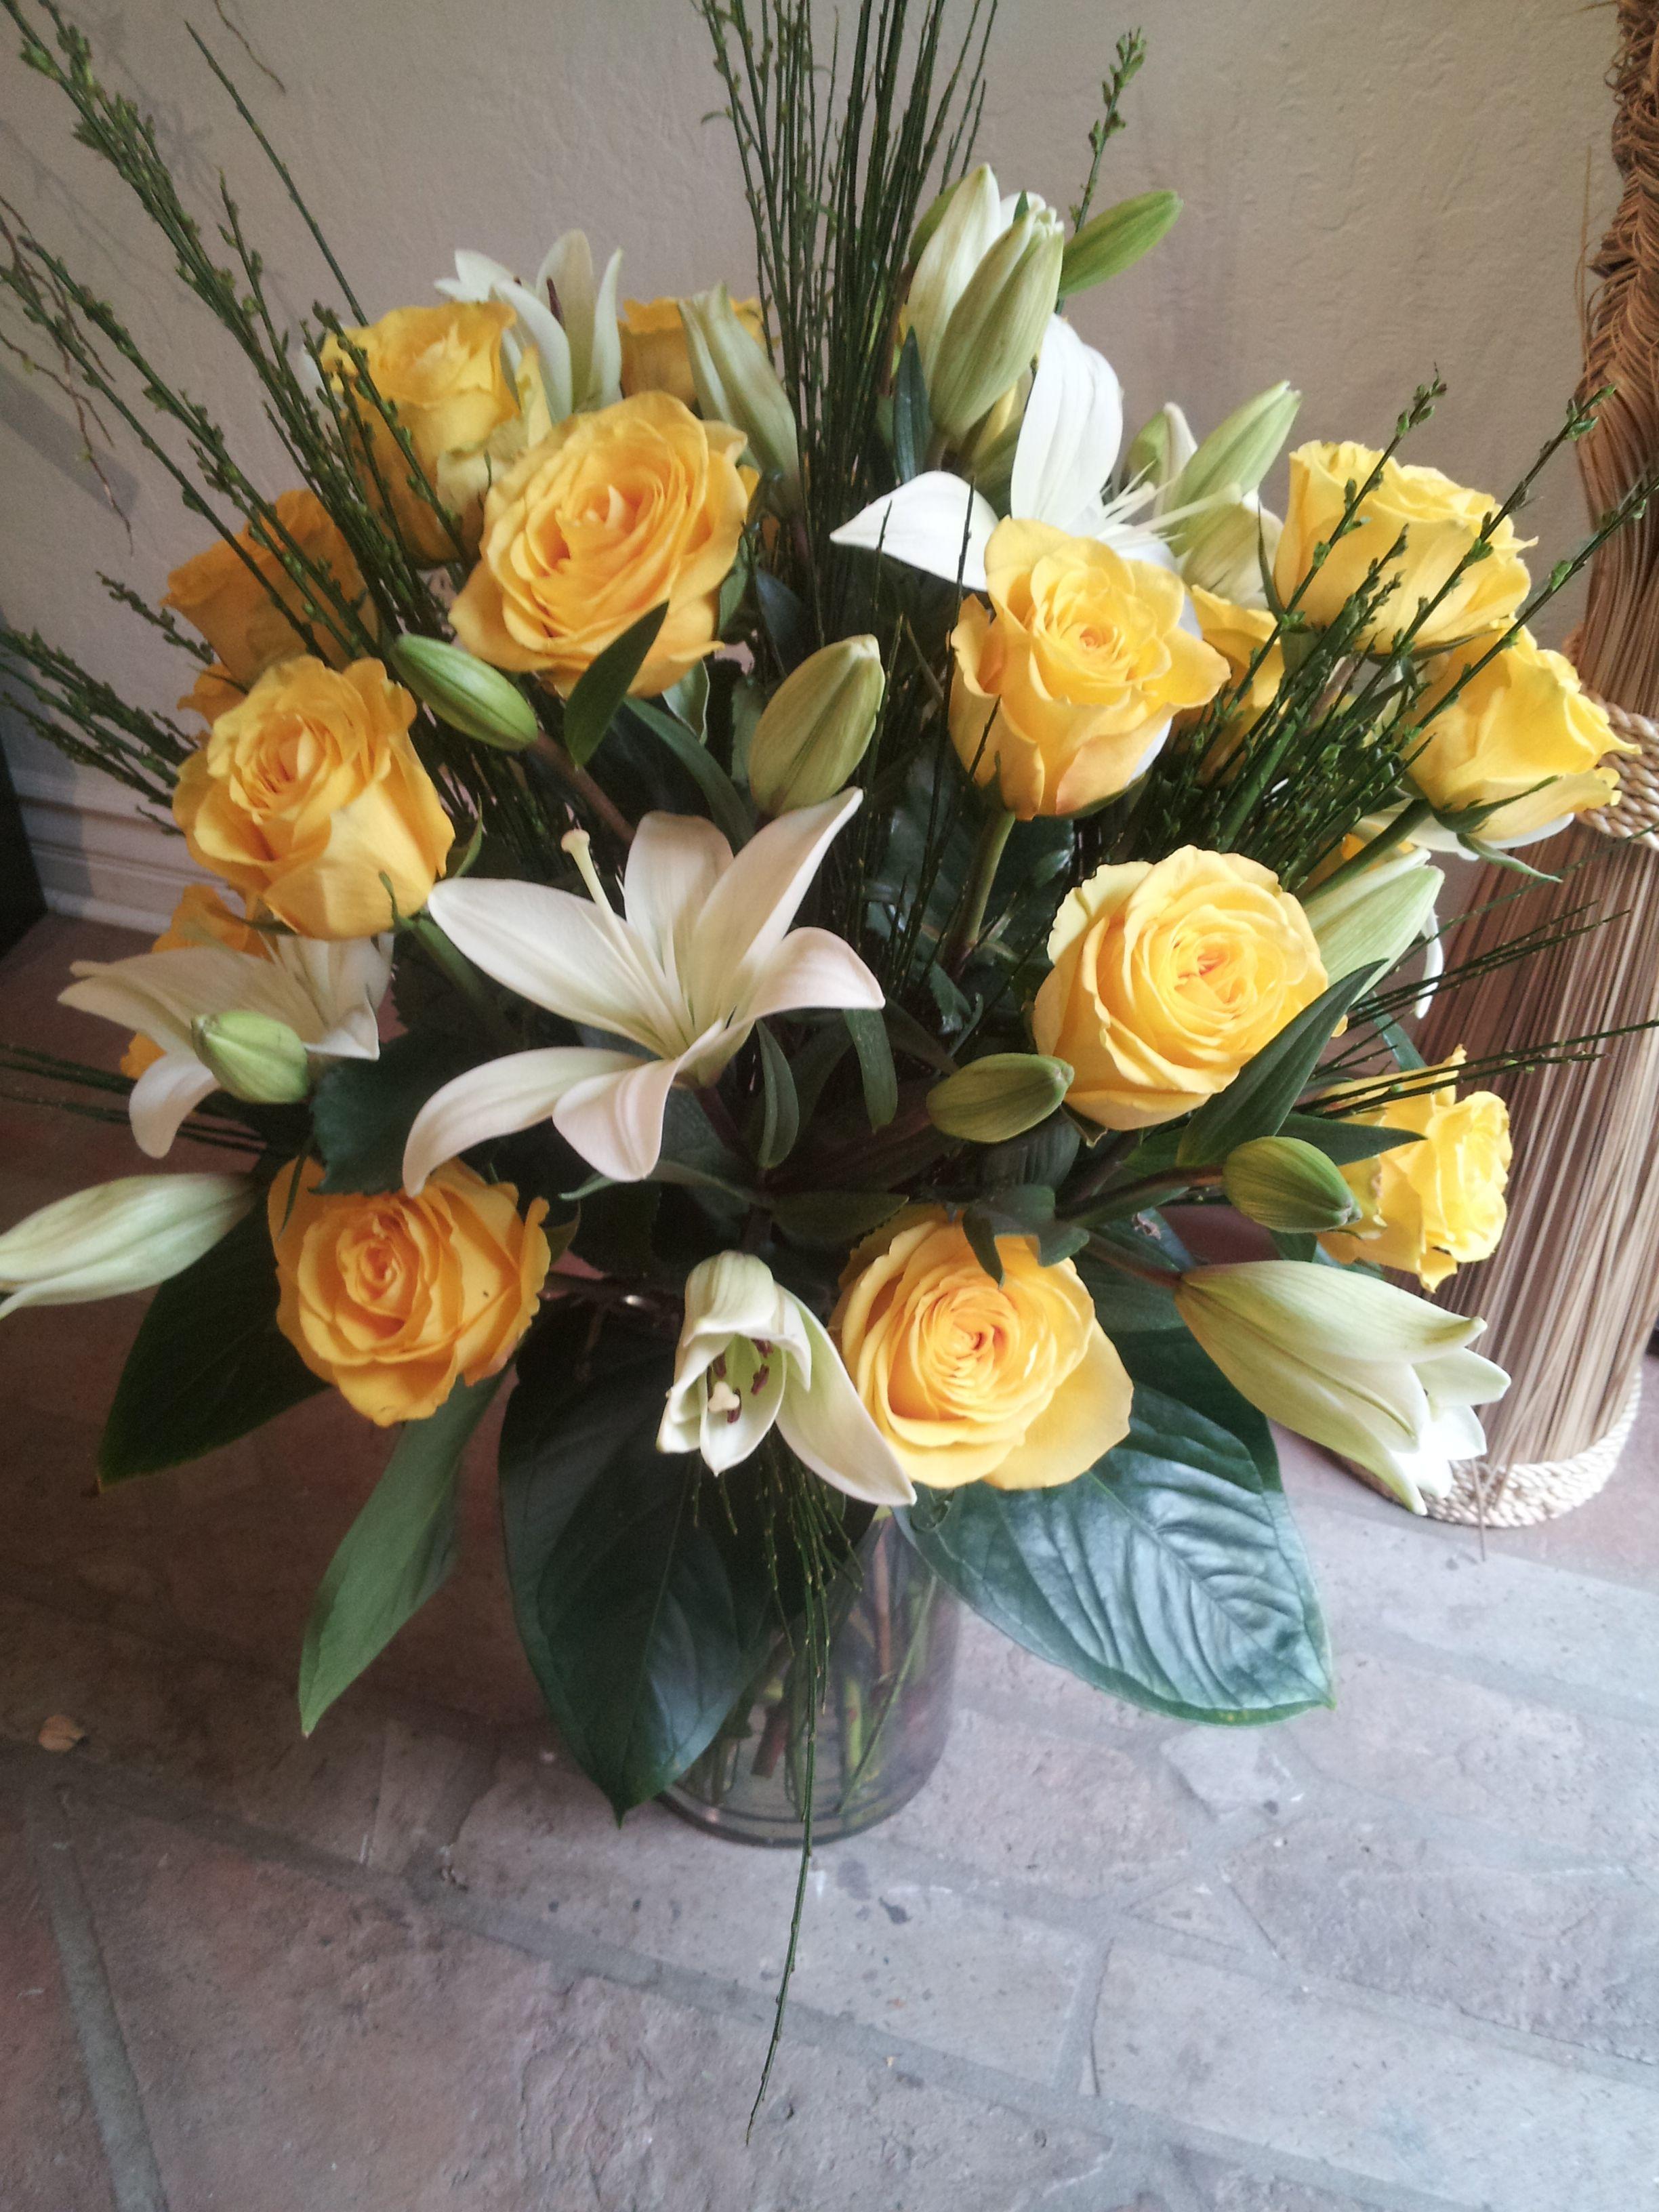 Huge Arrangement Of Lilies And Roses Pv Florist Arrangements